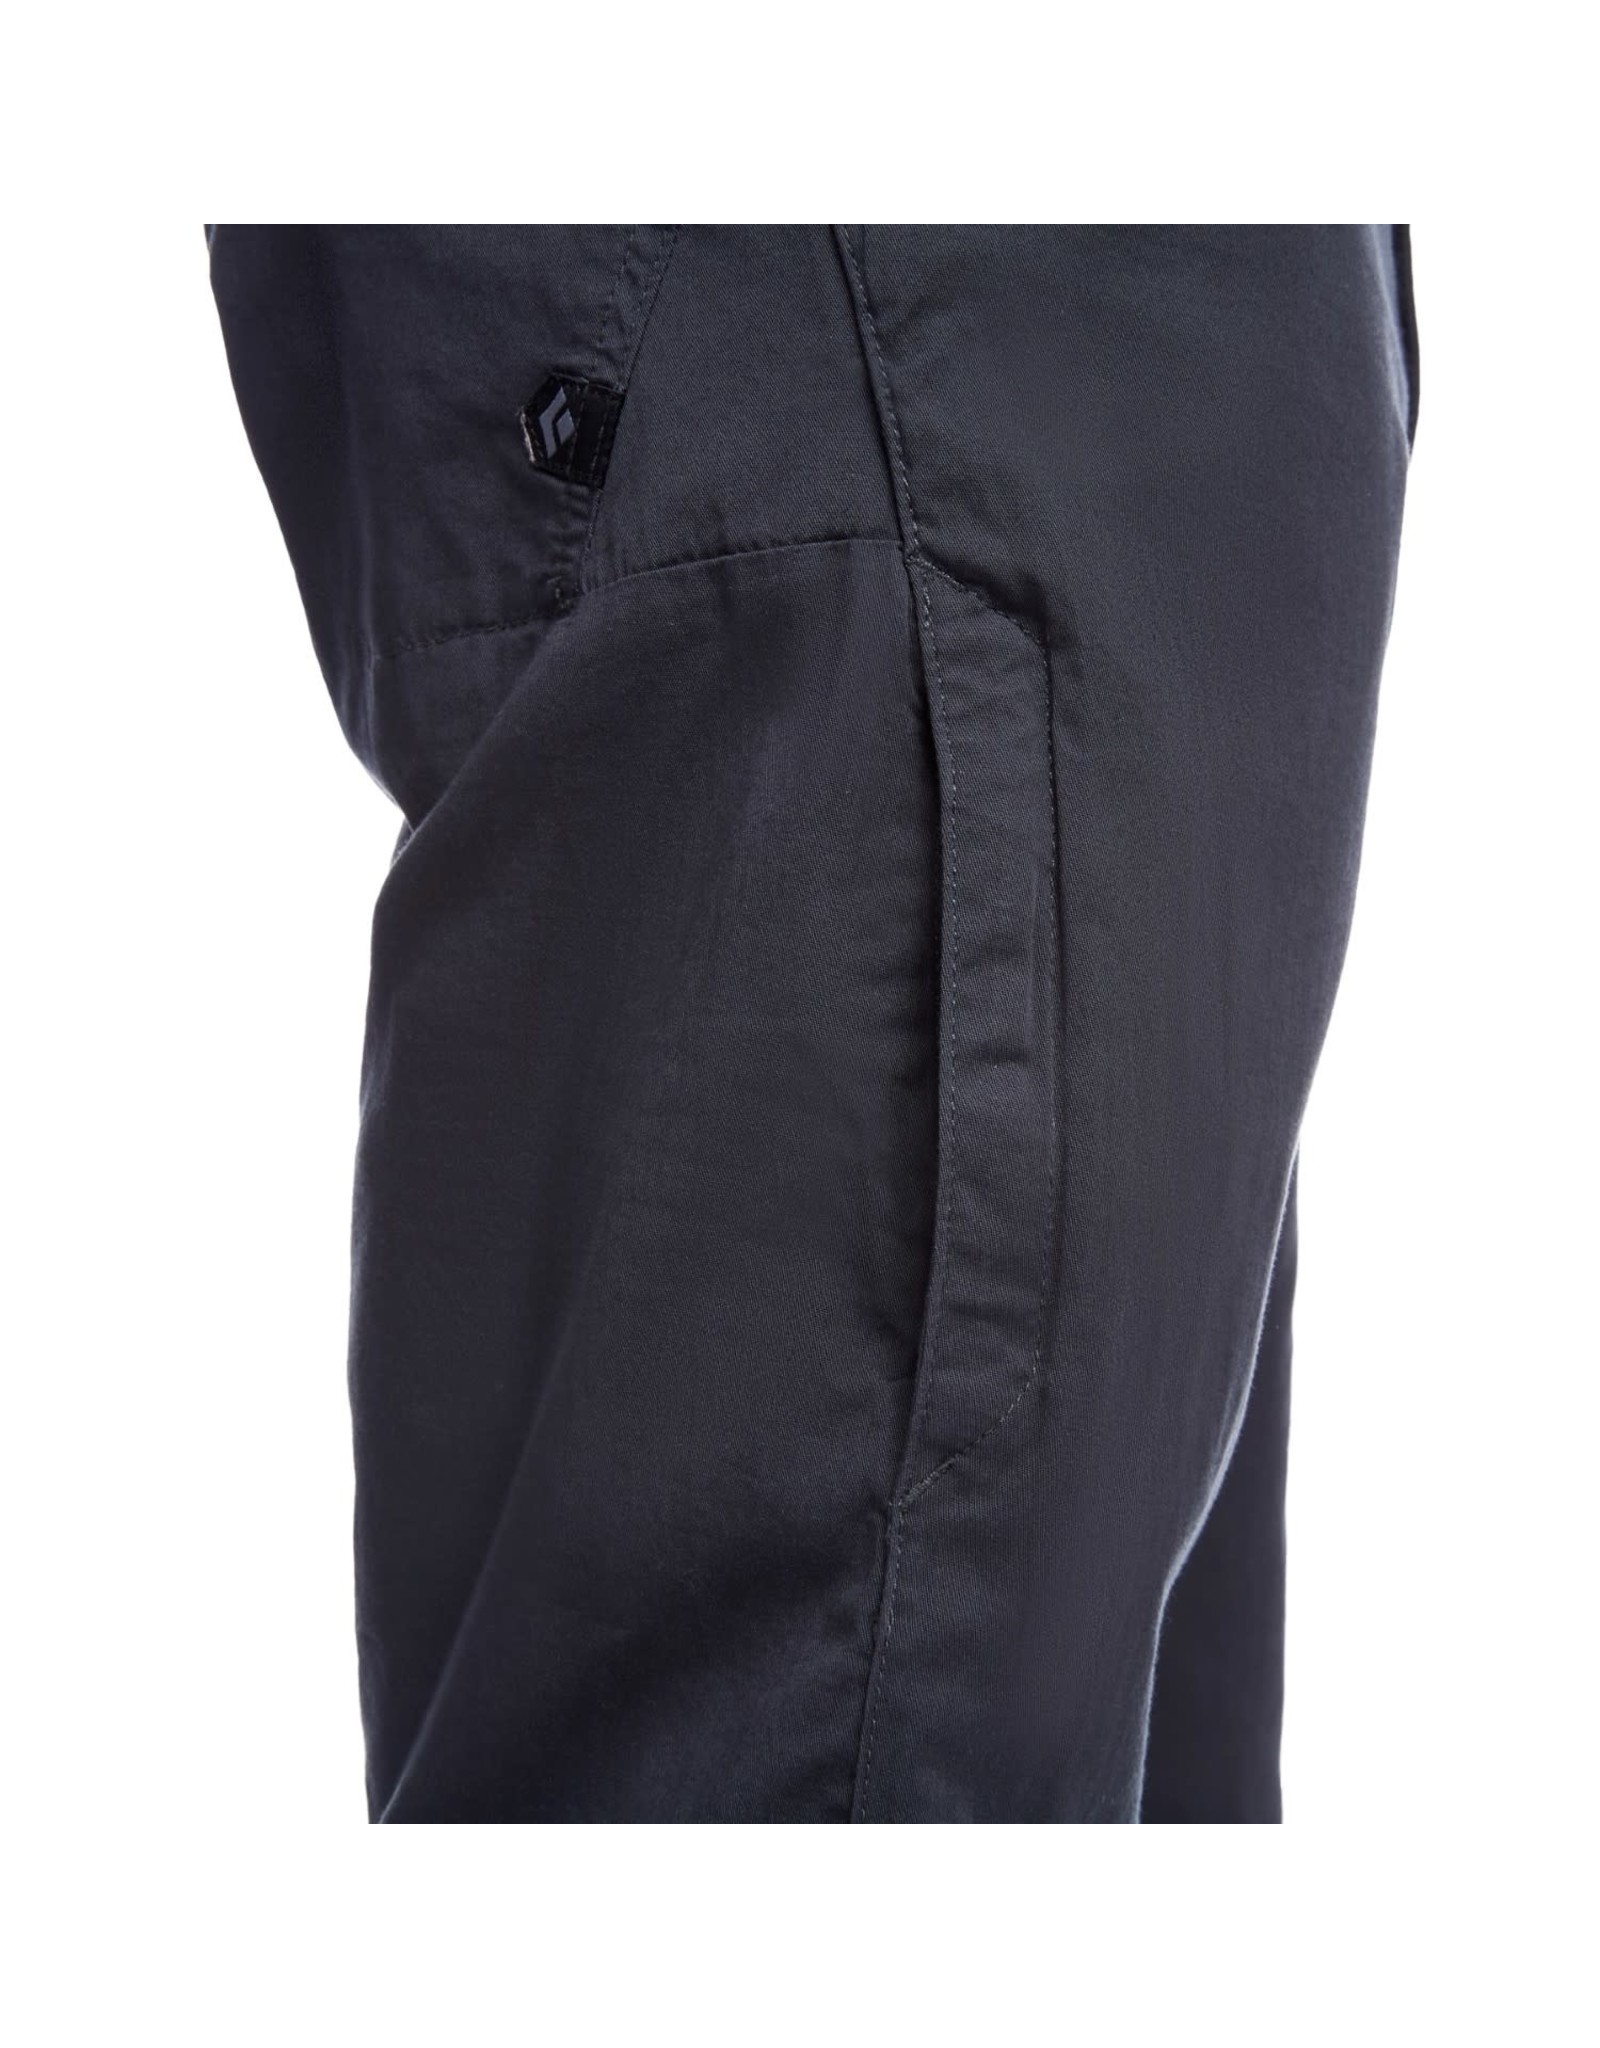 Black Diamond Black Diamond Credo Shorts - Men